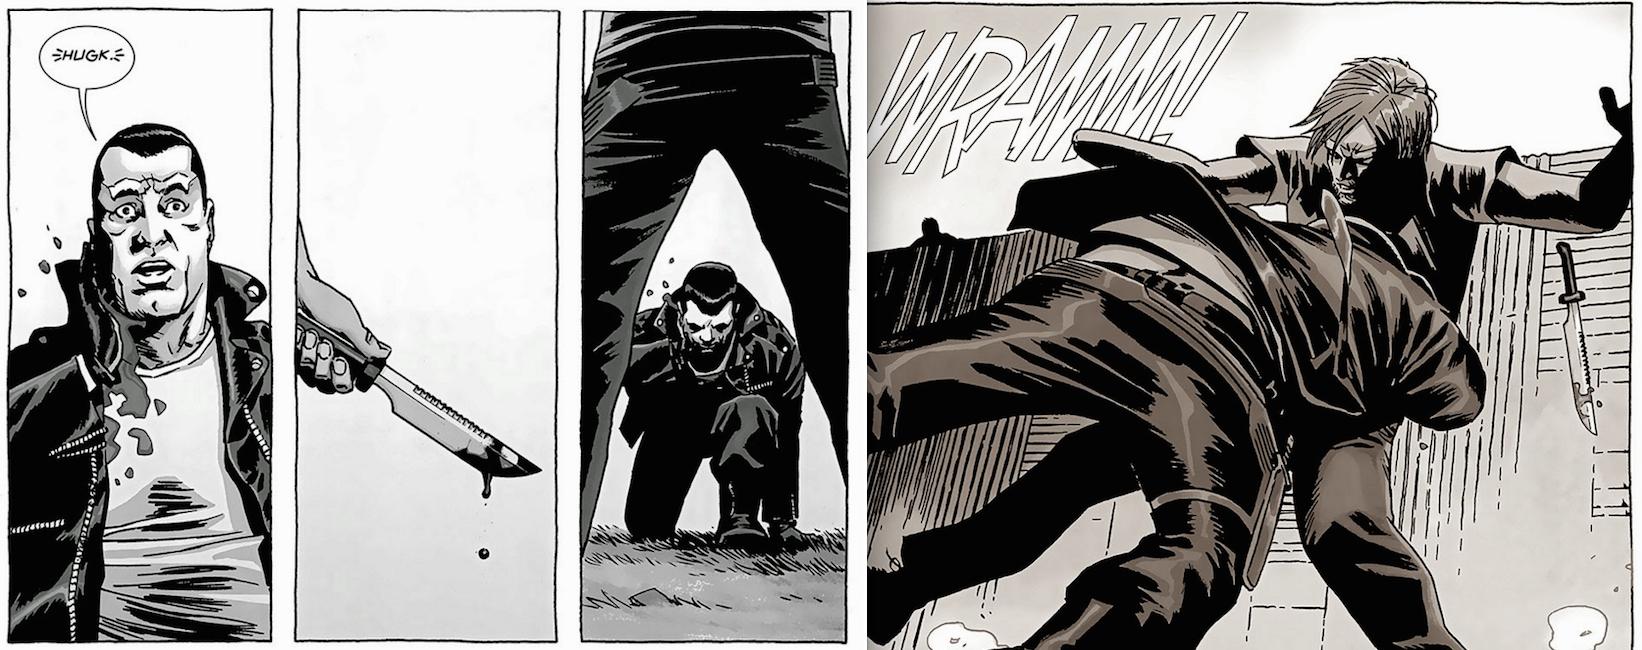 The Walking Dead - Negan is hard to stop!